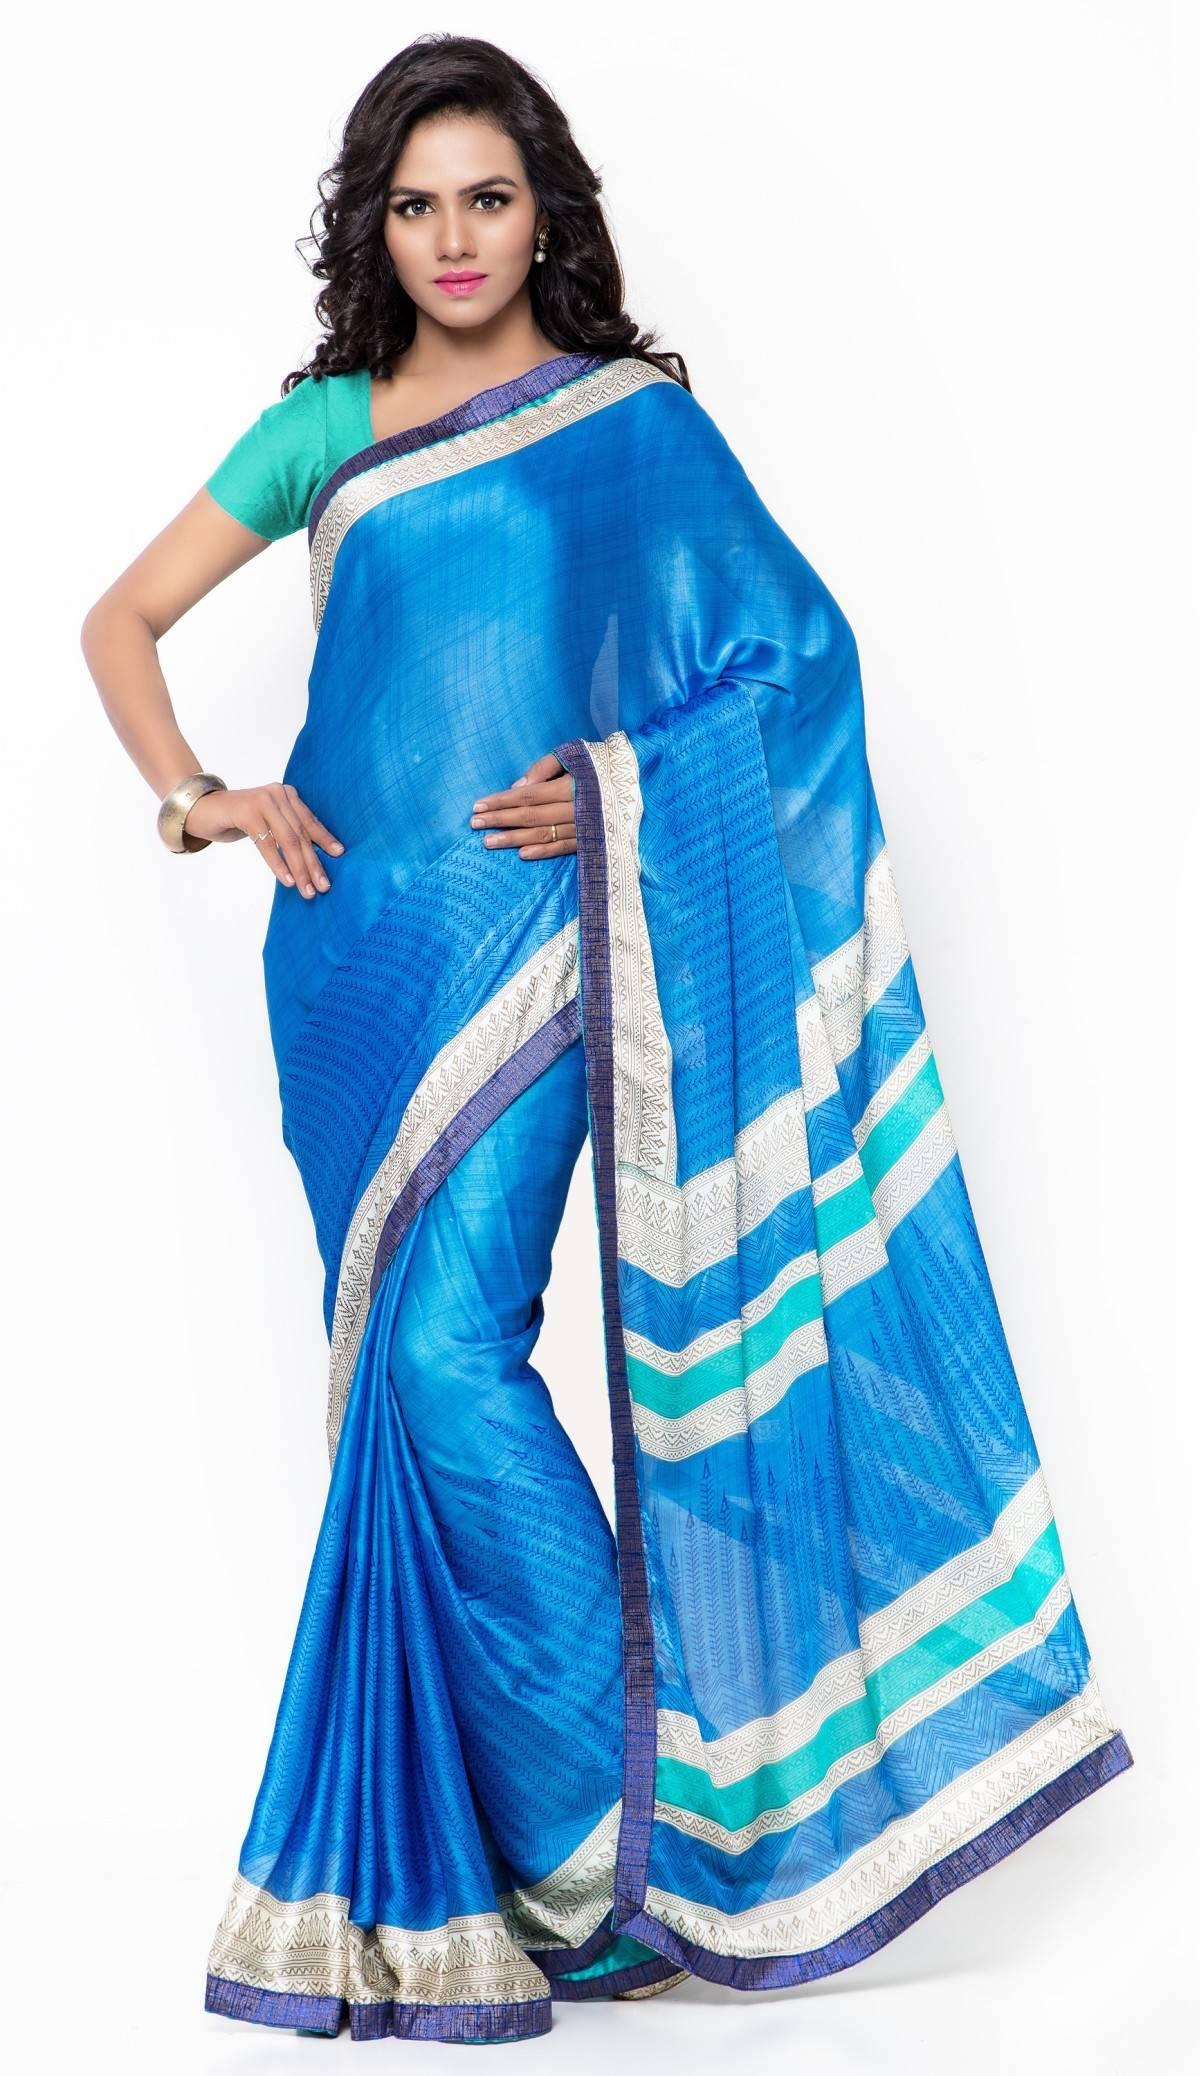 Printed Faux Georgette Saree (Sari) in Blue